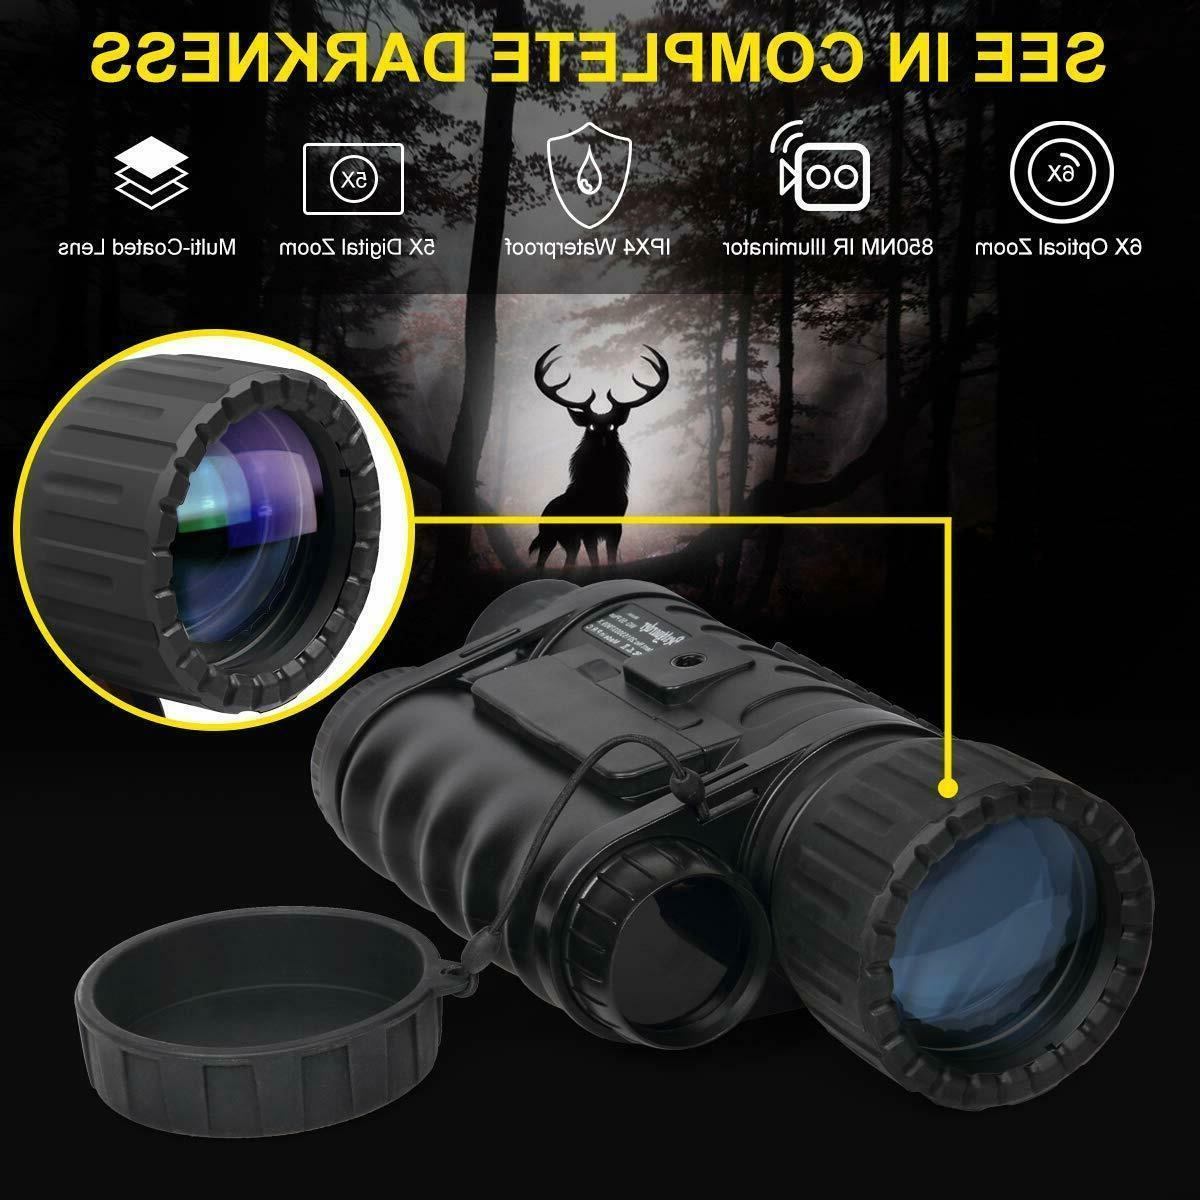 Infrared HD Night Vision Monocular WiFi,Bestguarder Plus,6-30X50MM Sm